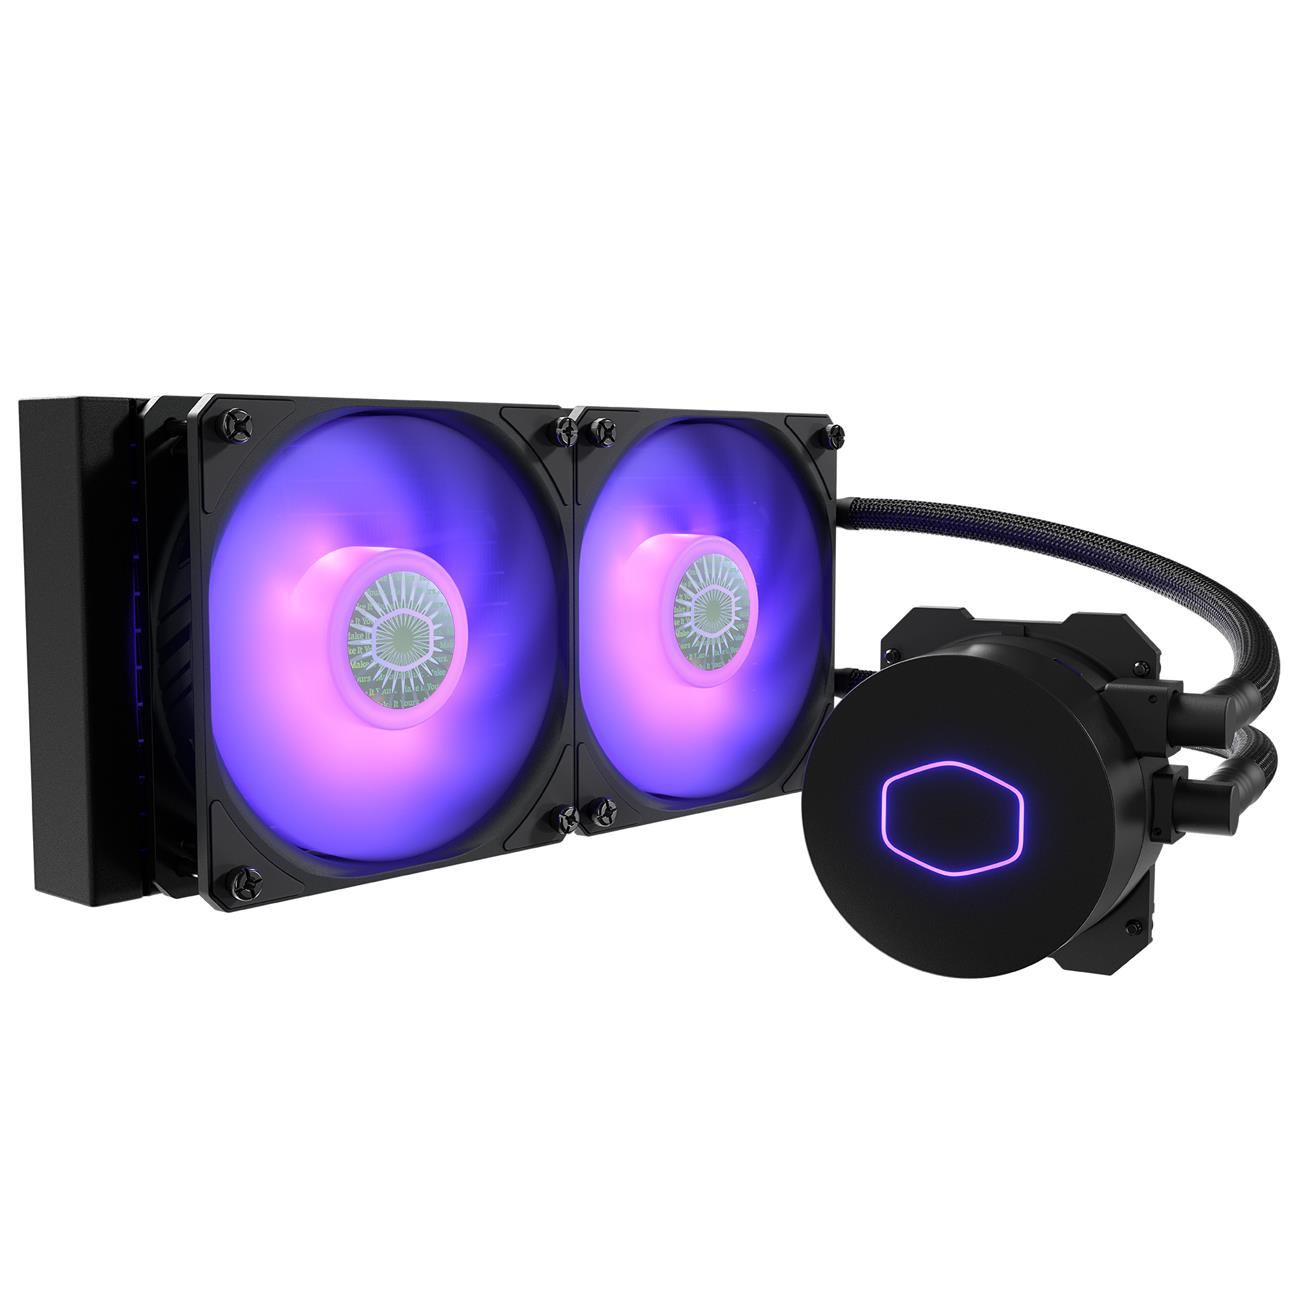 Cooler Master MasterLiquid ML240L V2 RGB to nowa wersja znanego AiO